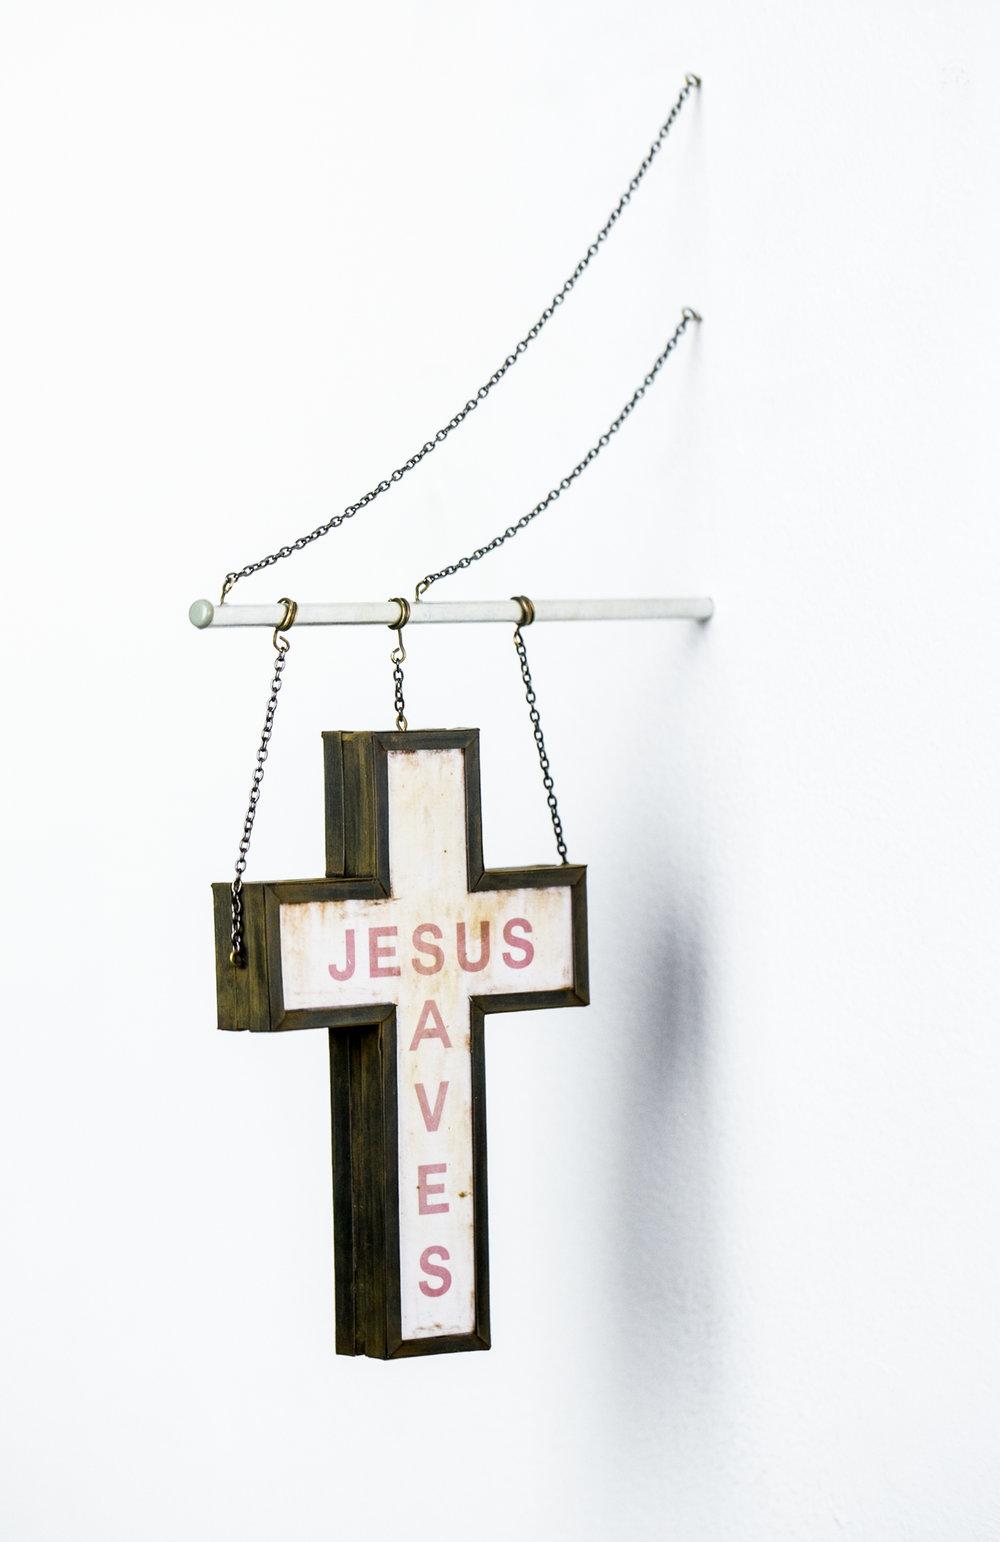 Jesus Saves Sign - SOLD